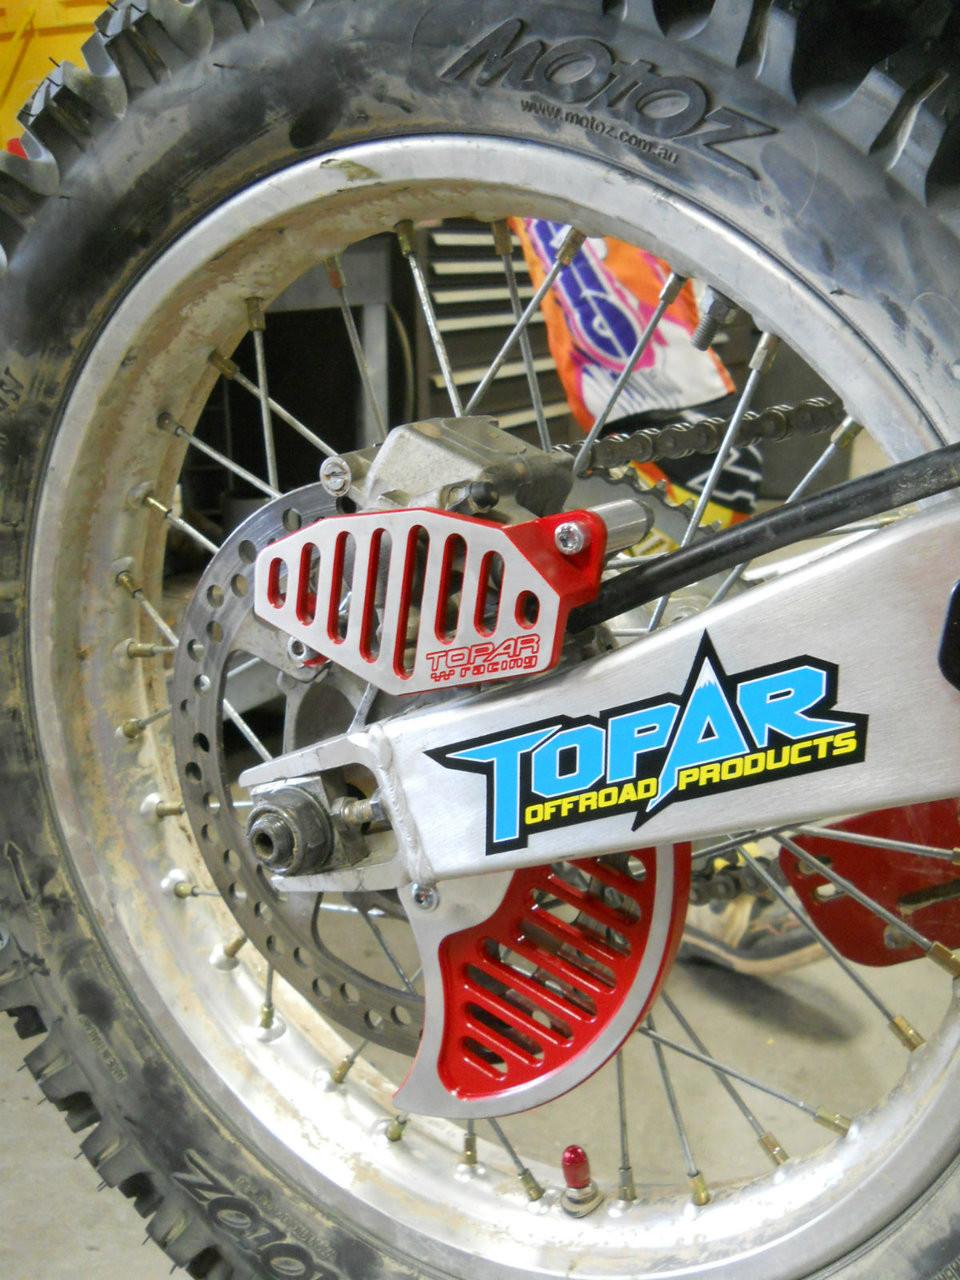 Topar Racing Rear Brake Rotor Disc Guard Fin for HONDA 1997-2001 CR125R, CR250R and 2000-2007 XR650R (MOUNTS TO OEM BRACKET)) SHOWN WITH 130-108-HCR BRAKE CALIPER GUARD